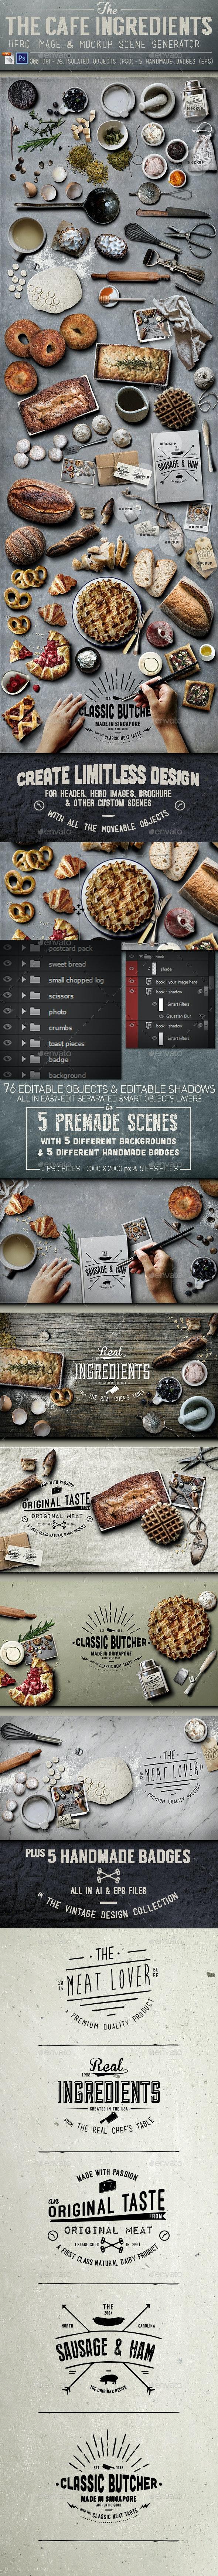 Cafe Ingredients Hero Image - Hero Images Graphics